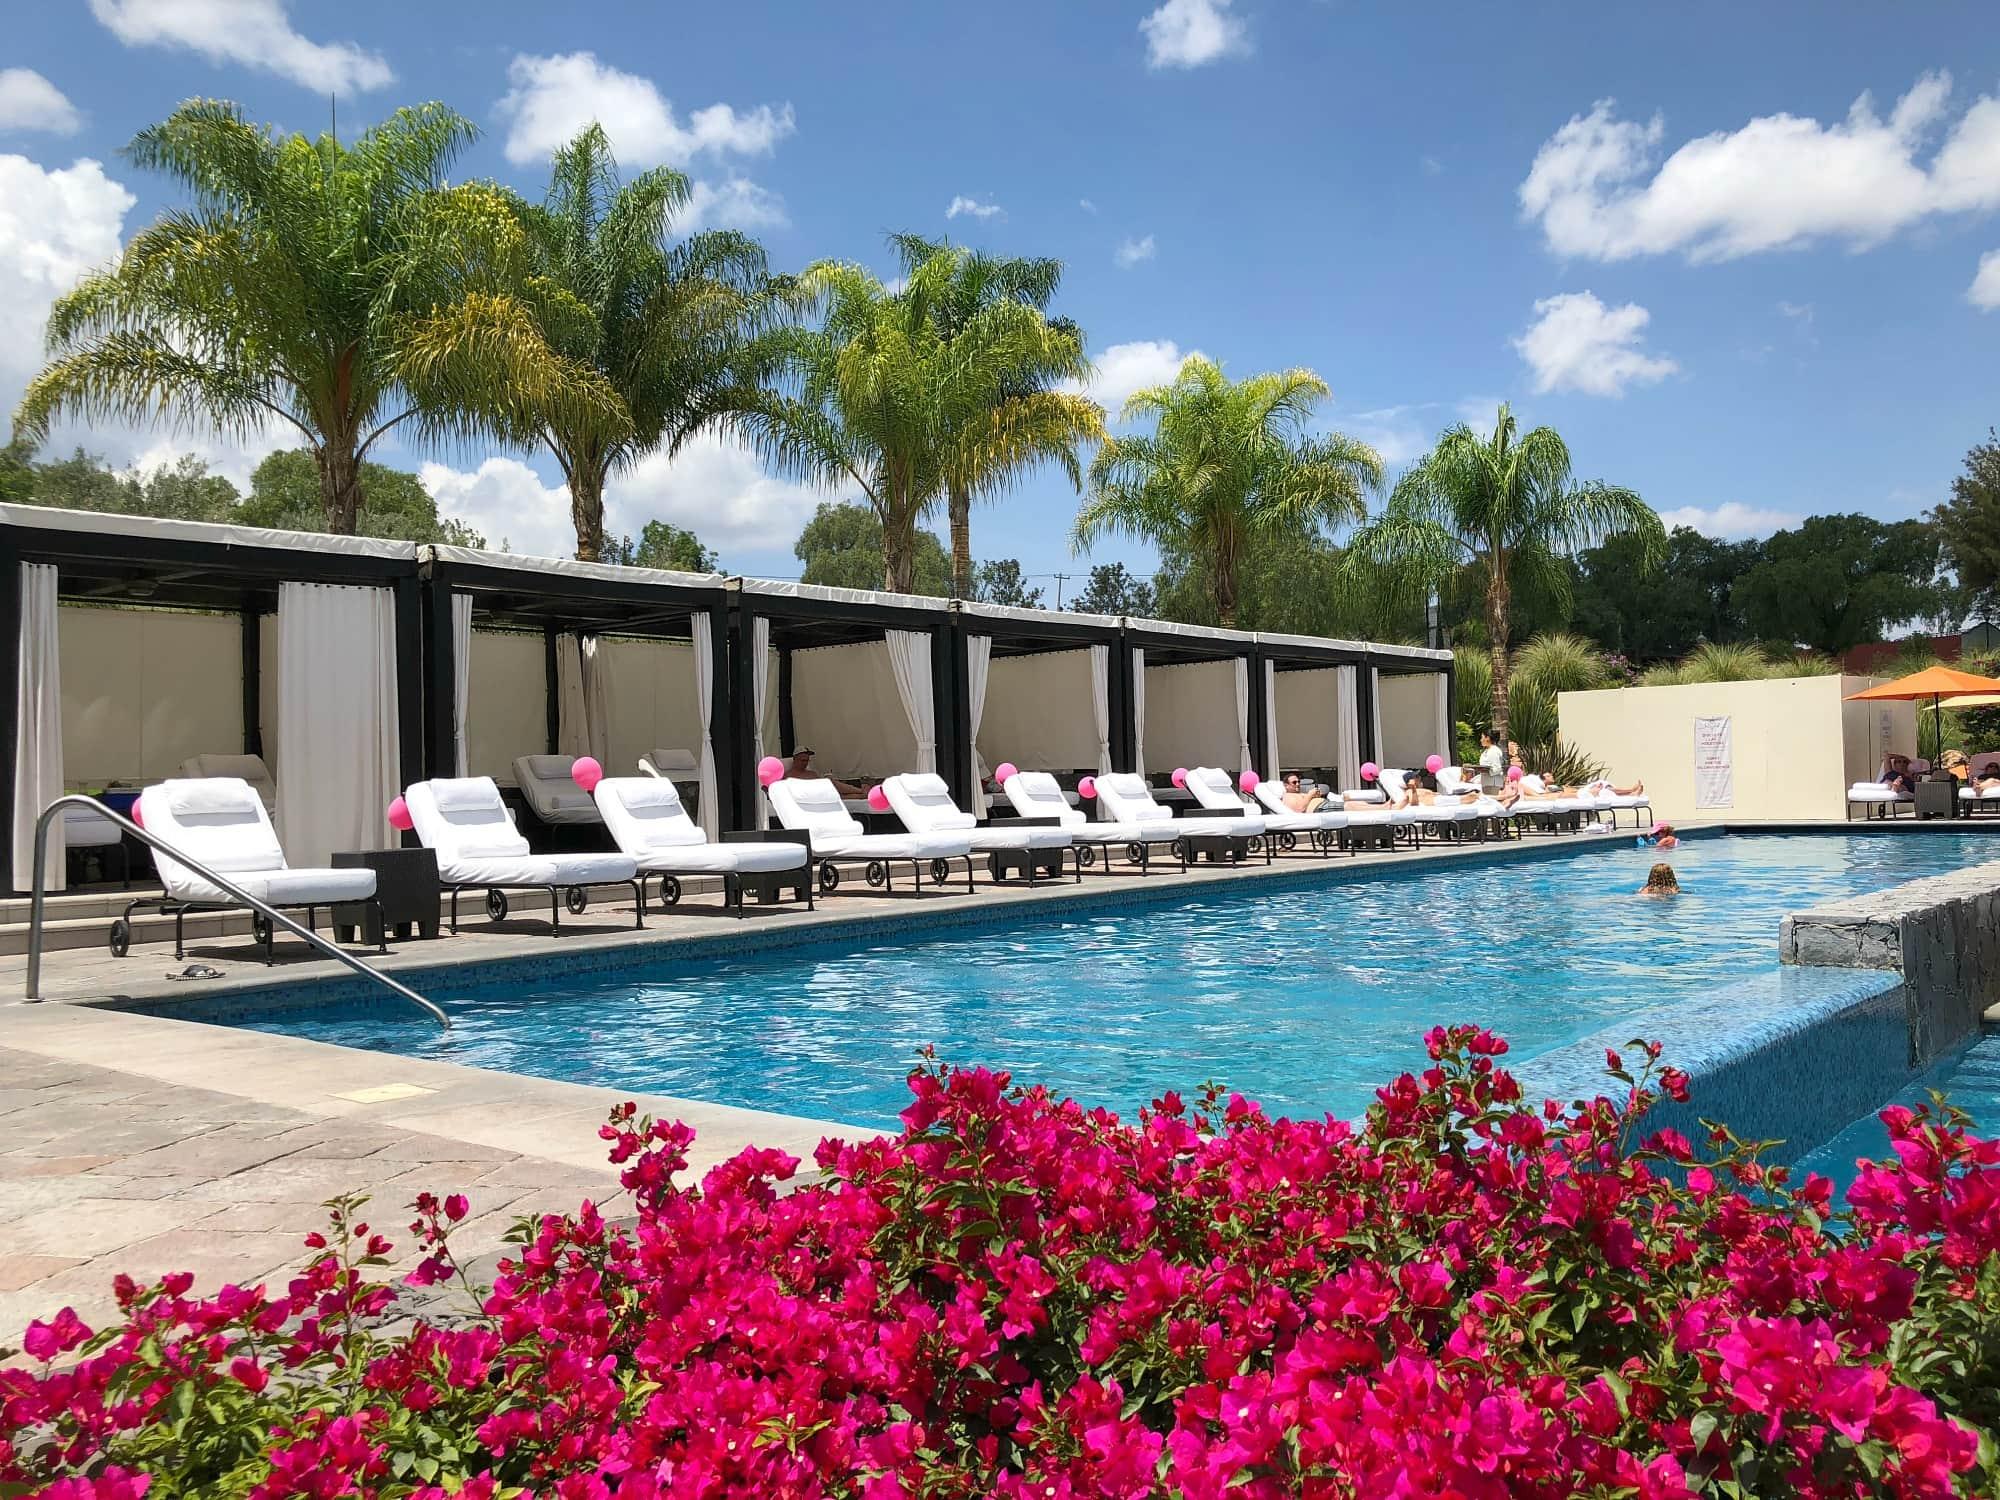 Rosewood Hotel San Miguel de Allende pool